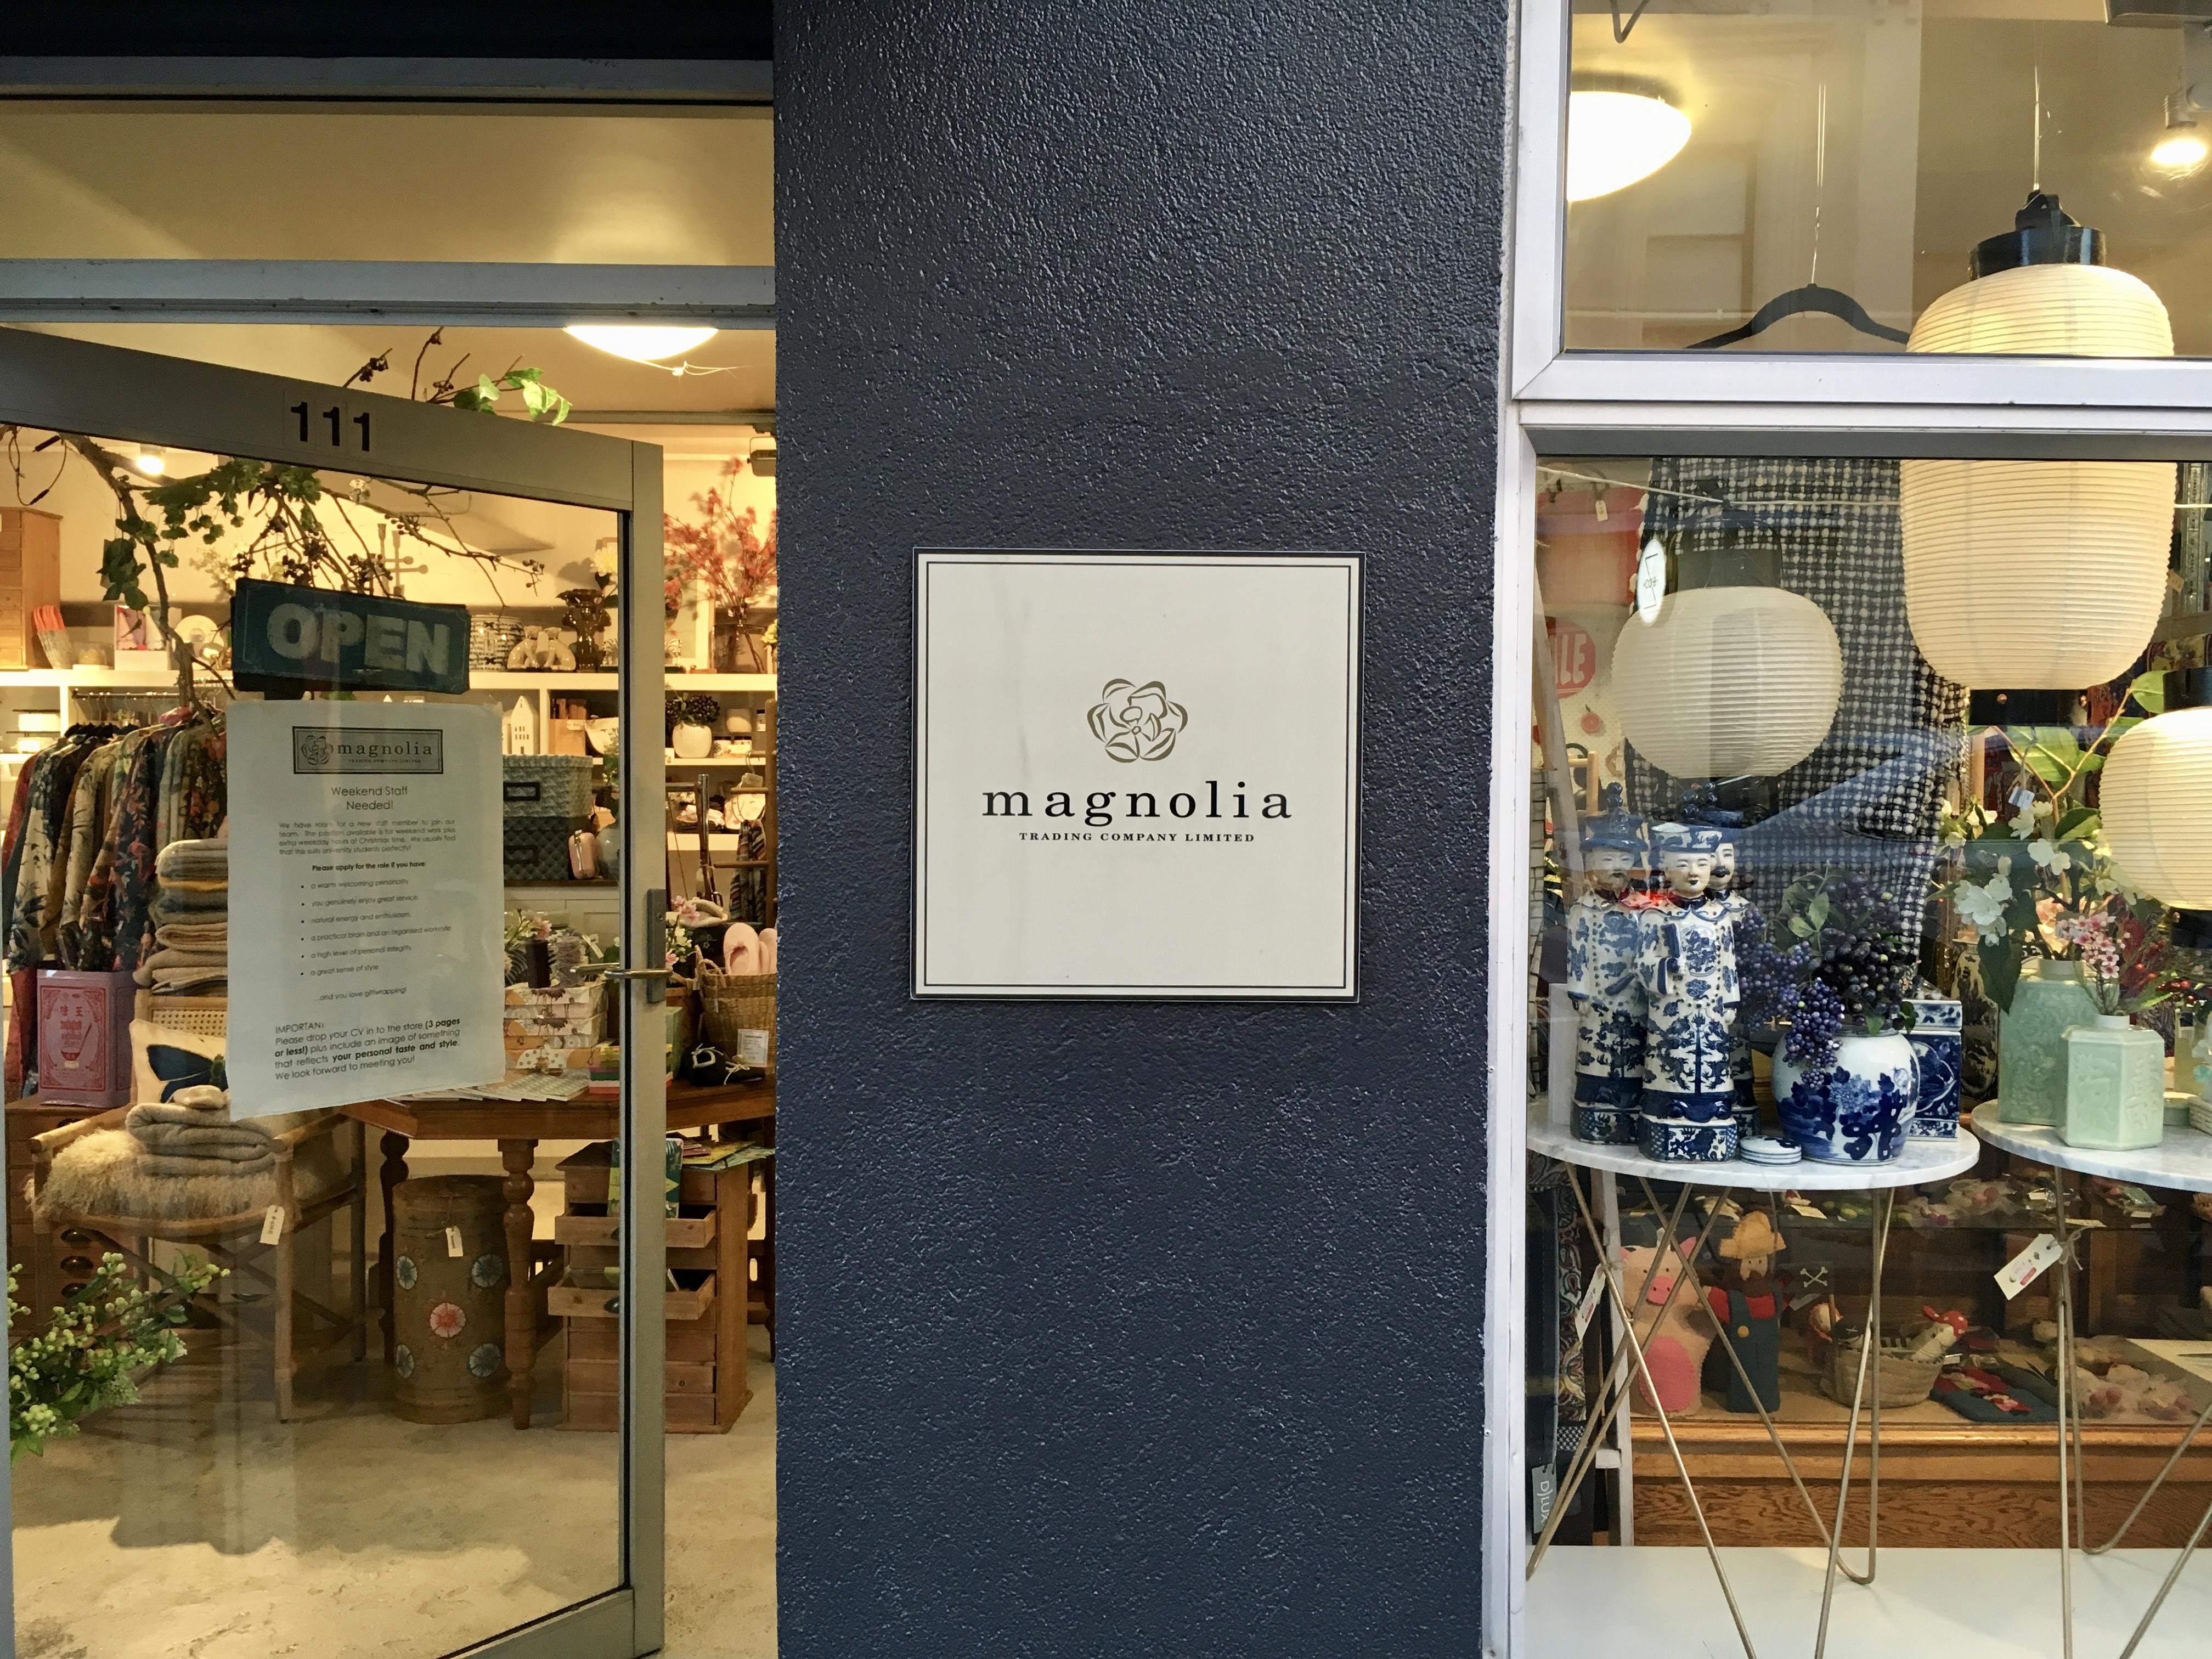 Magnolia Trading Company